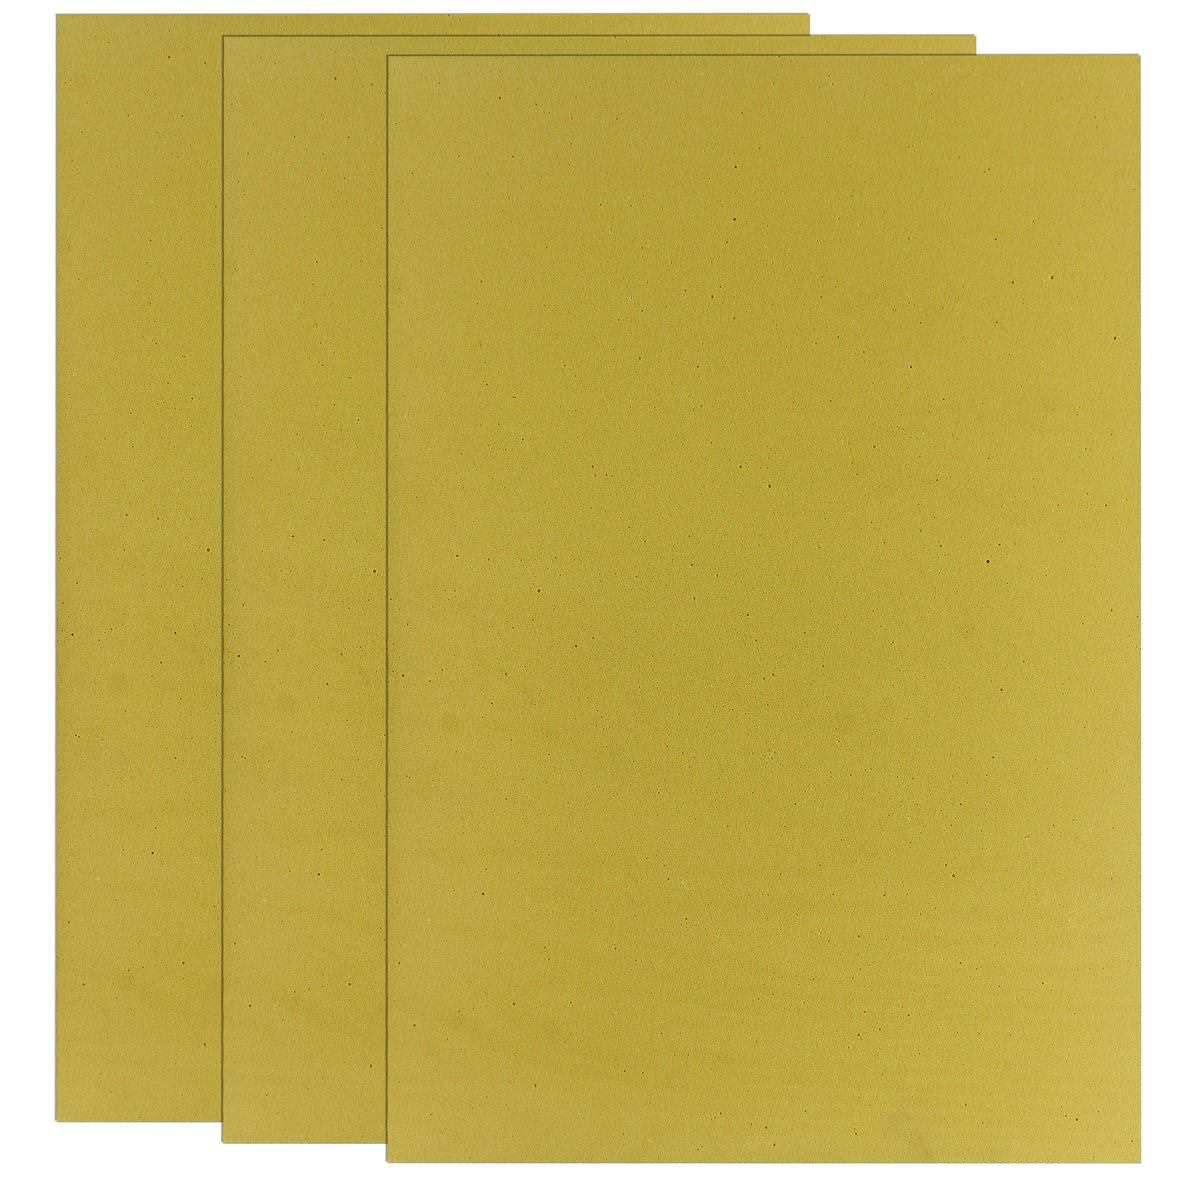 Foam Sheets A4 Size Without Sticker 3MM Khaki